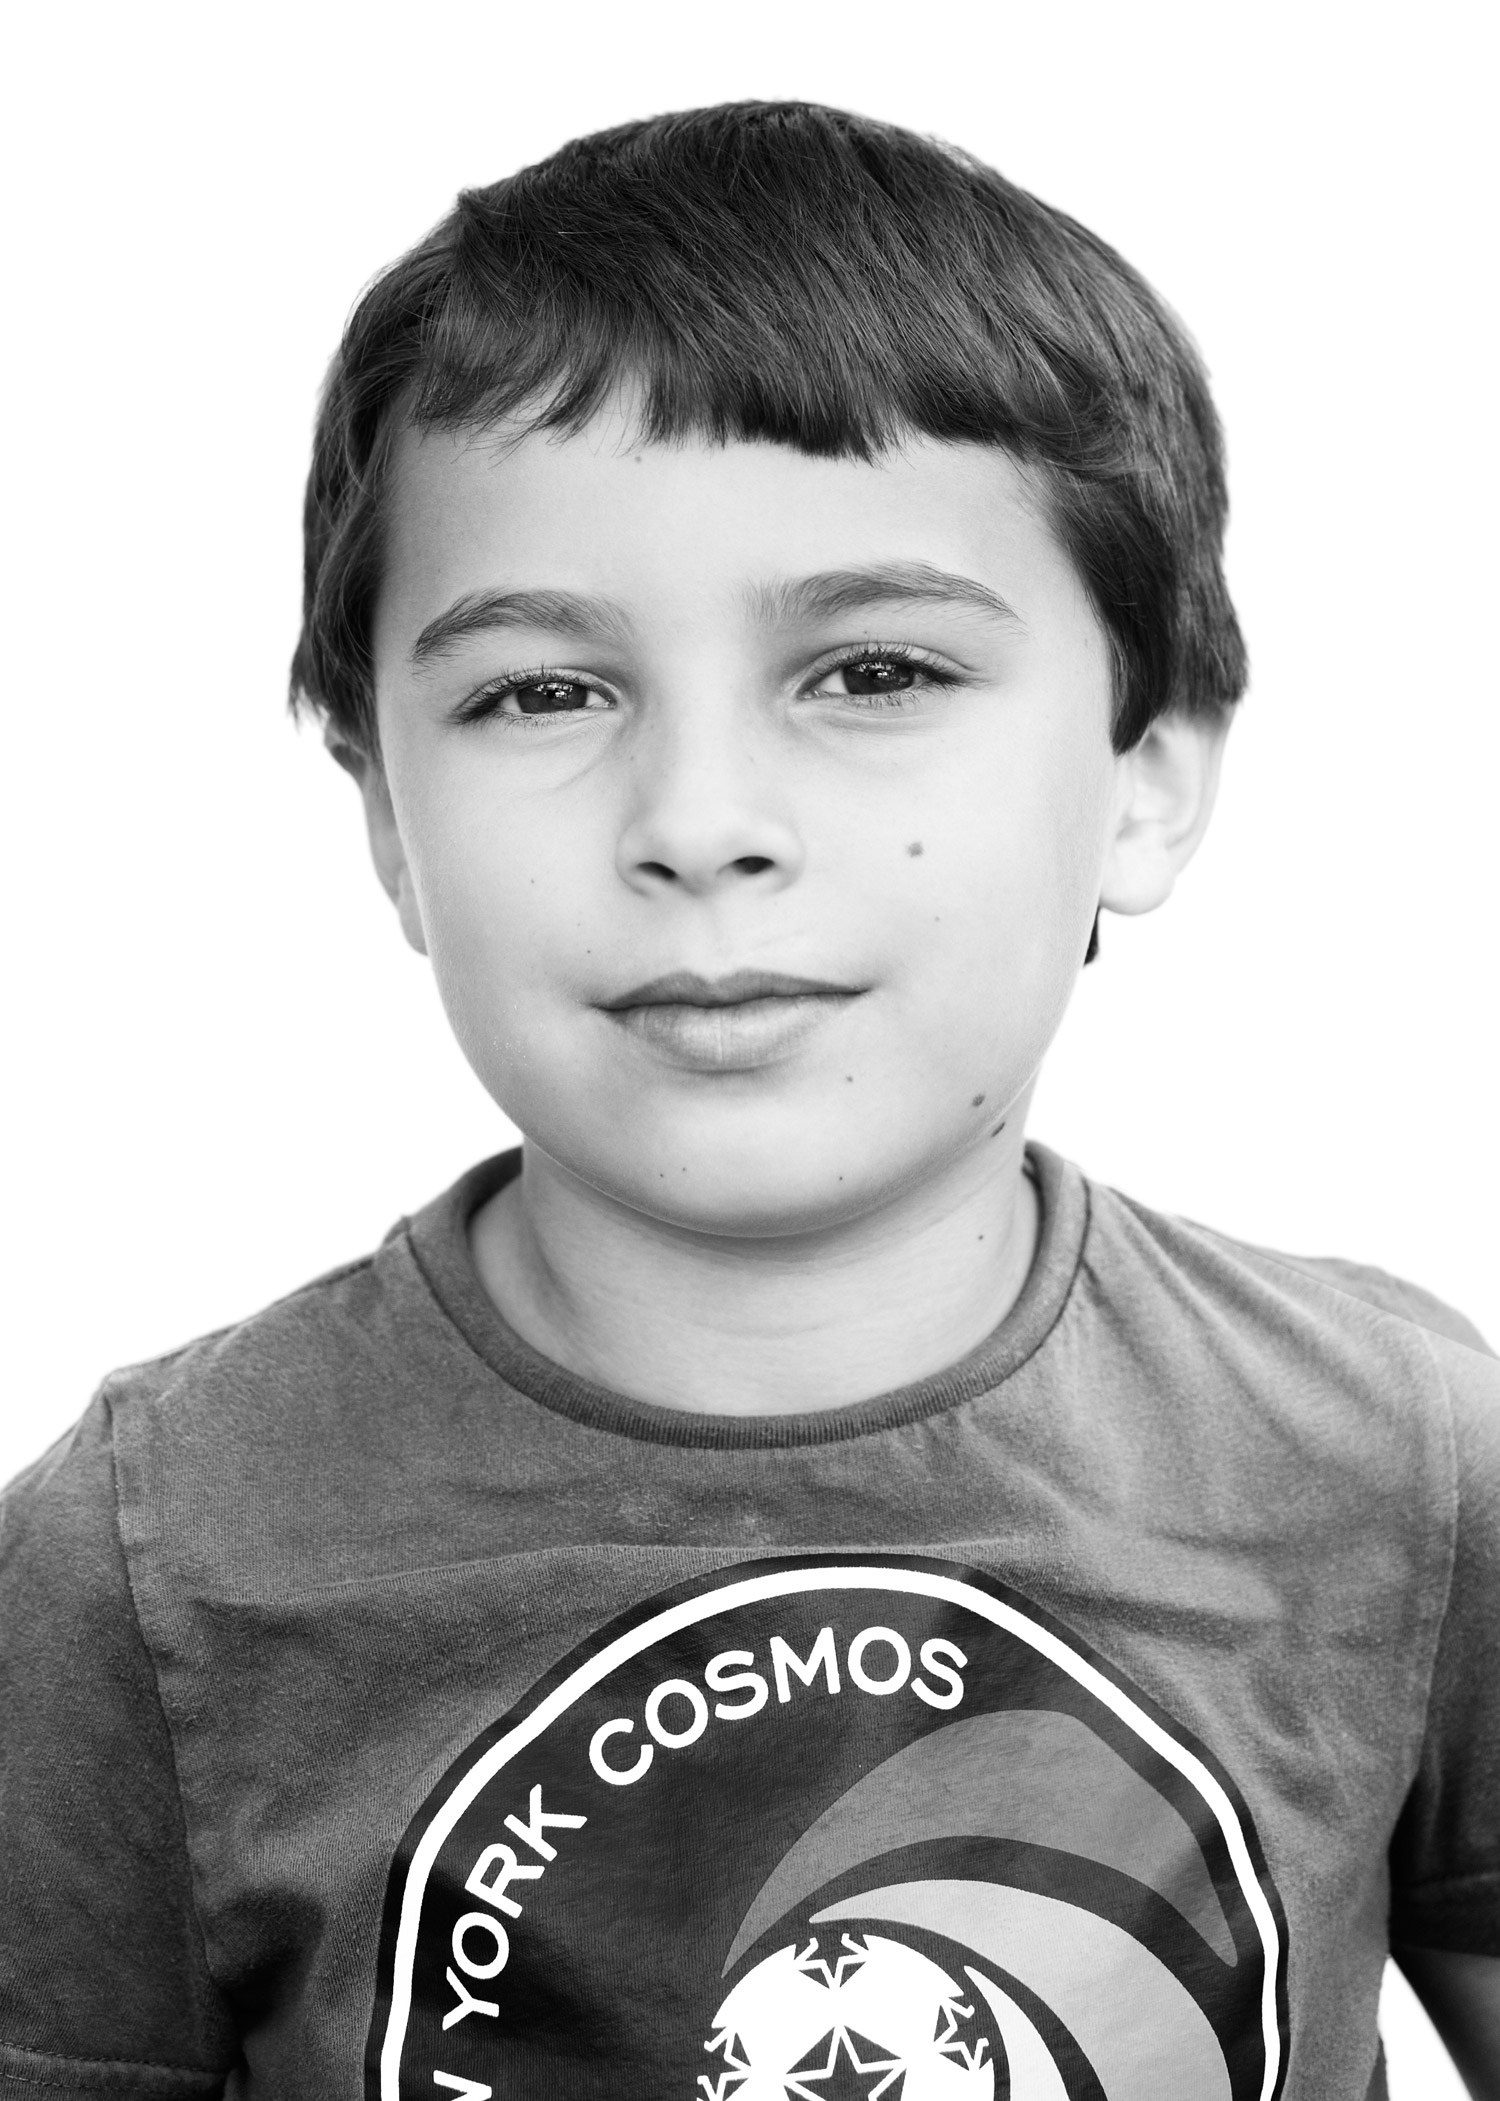 551-Giancarlo.jpg